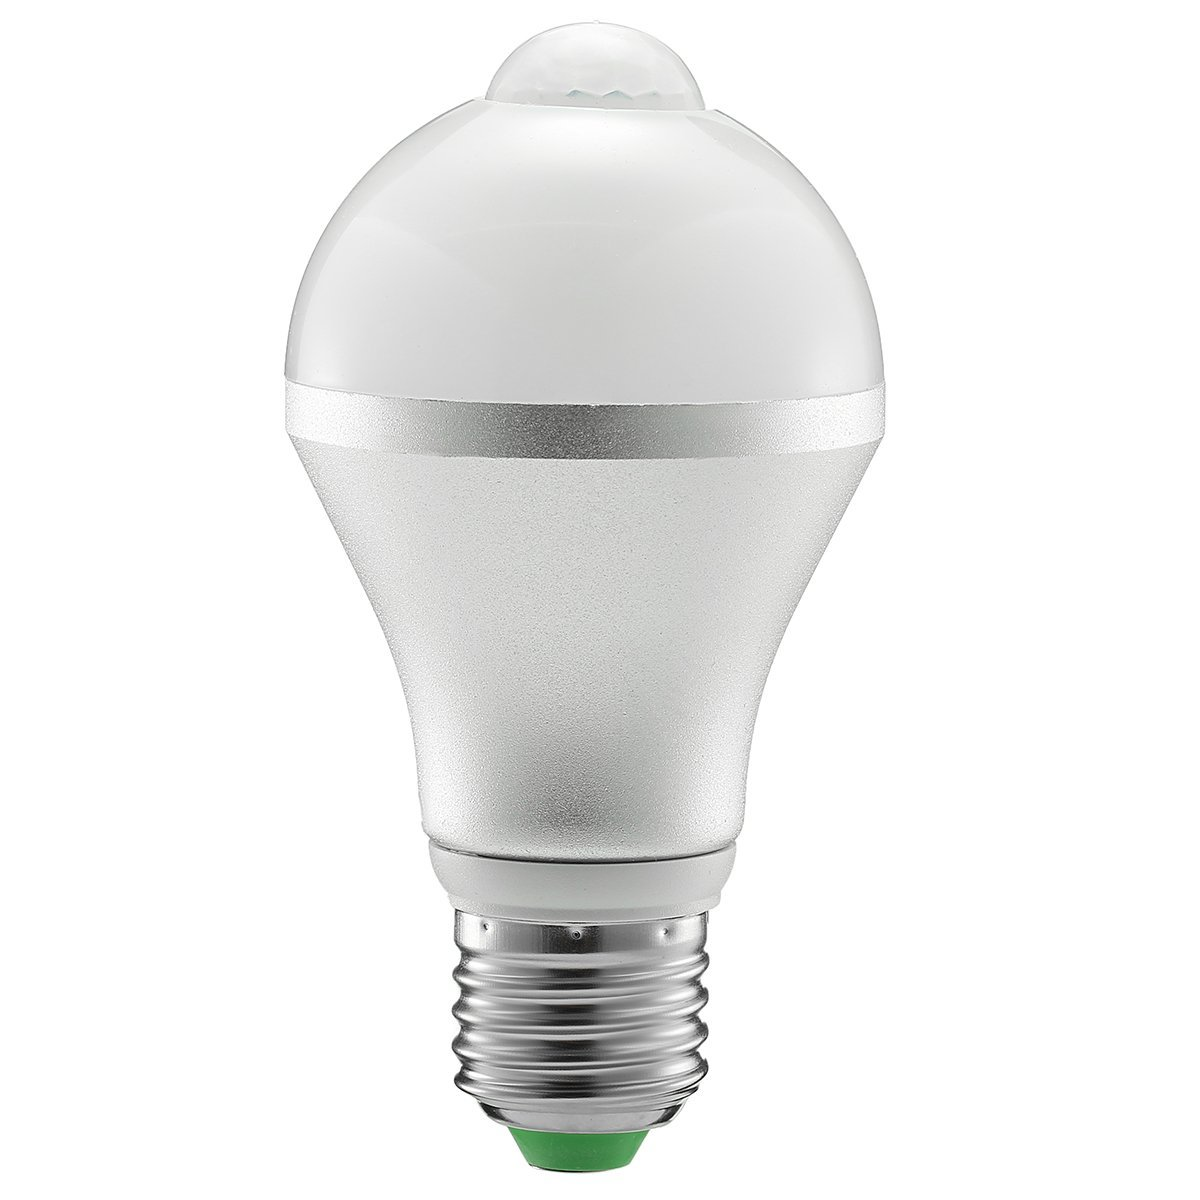 Motion Sensor Light Bulb, KINGSO E27 7W PIR Infrared Motion Sensor Lamp - 5730 SMD 14LED Detection Light, Auto Switch Night Lights for Stairs Lobby Carport Hallway Security 85-265V Warm White